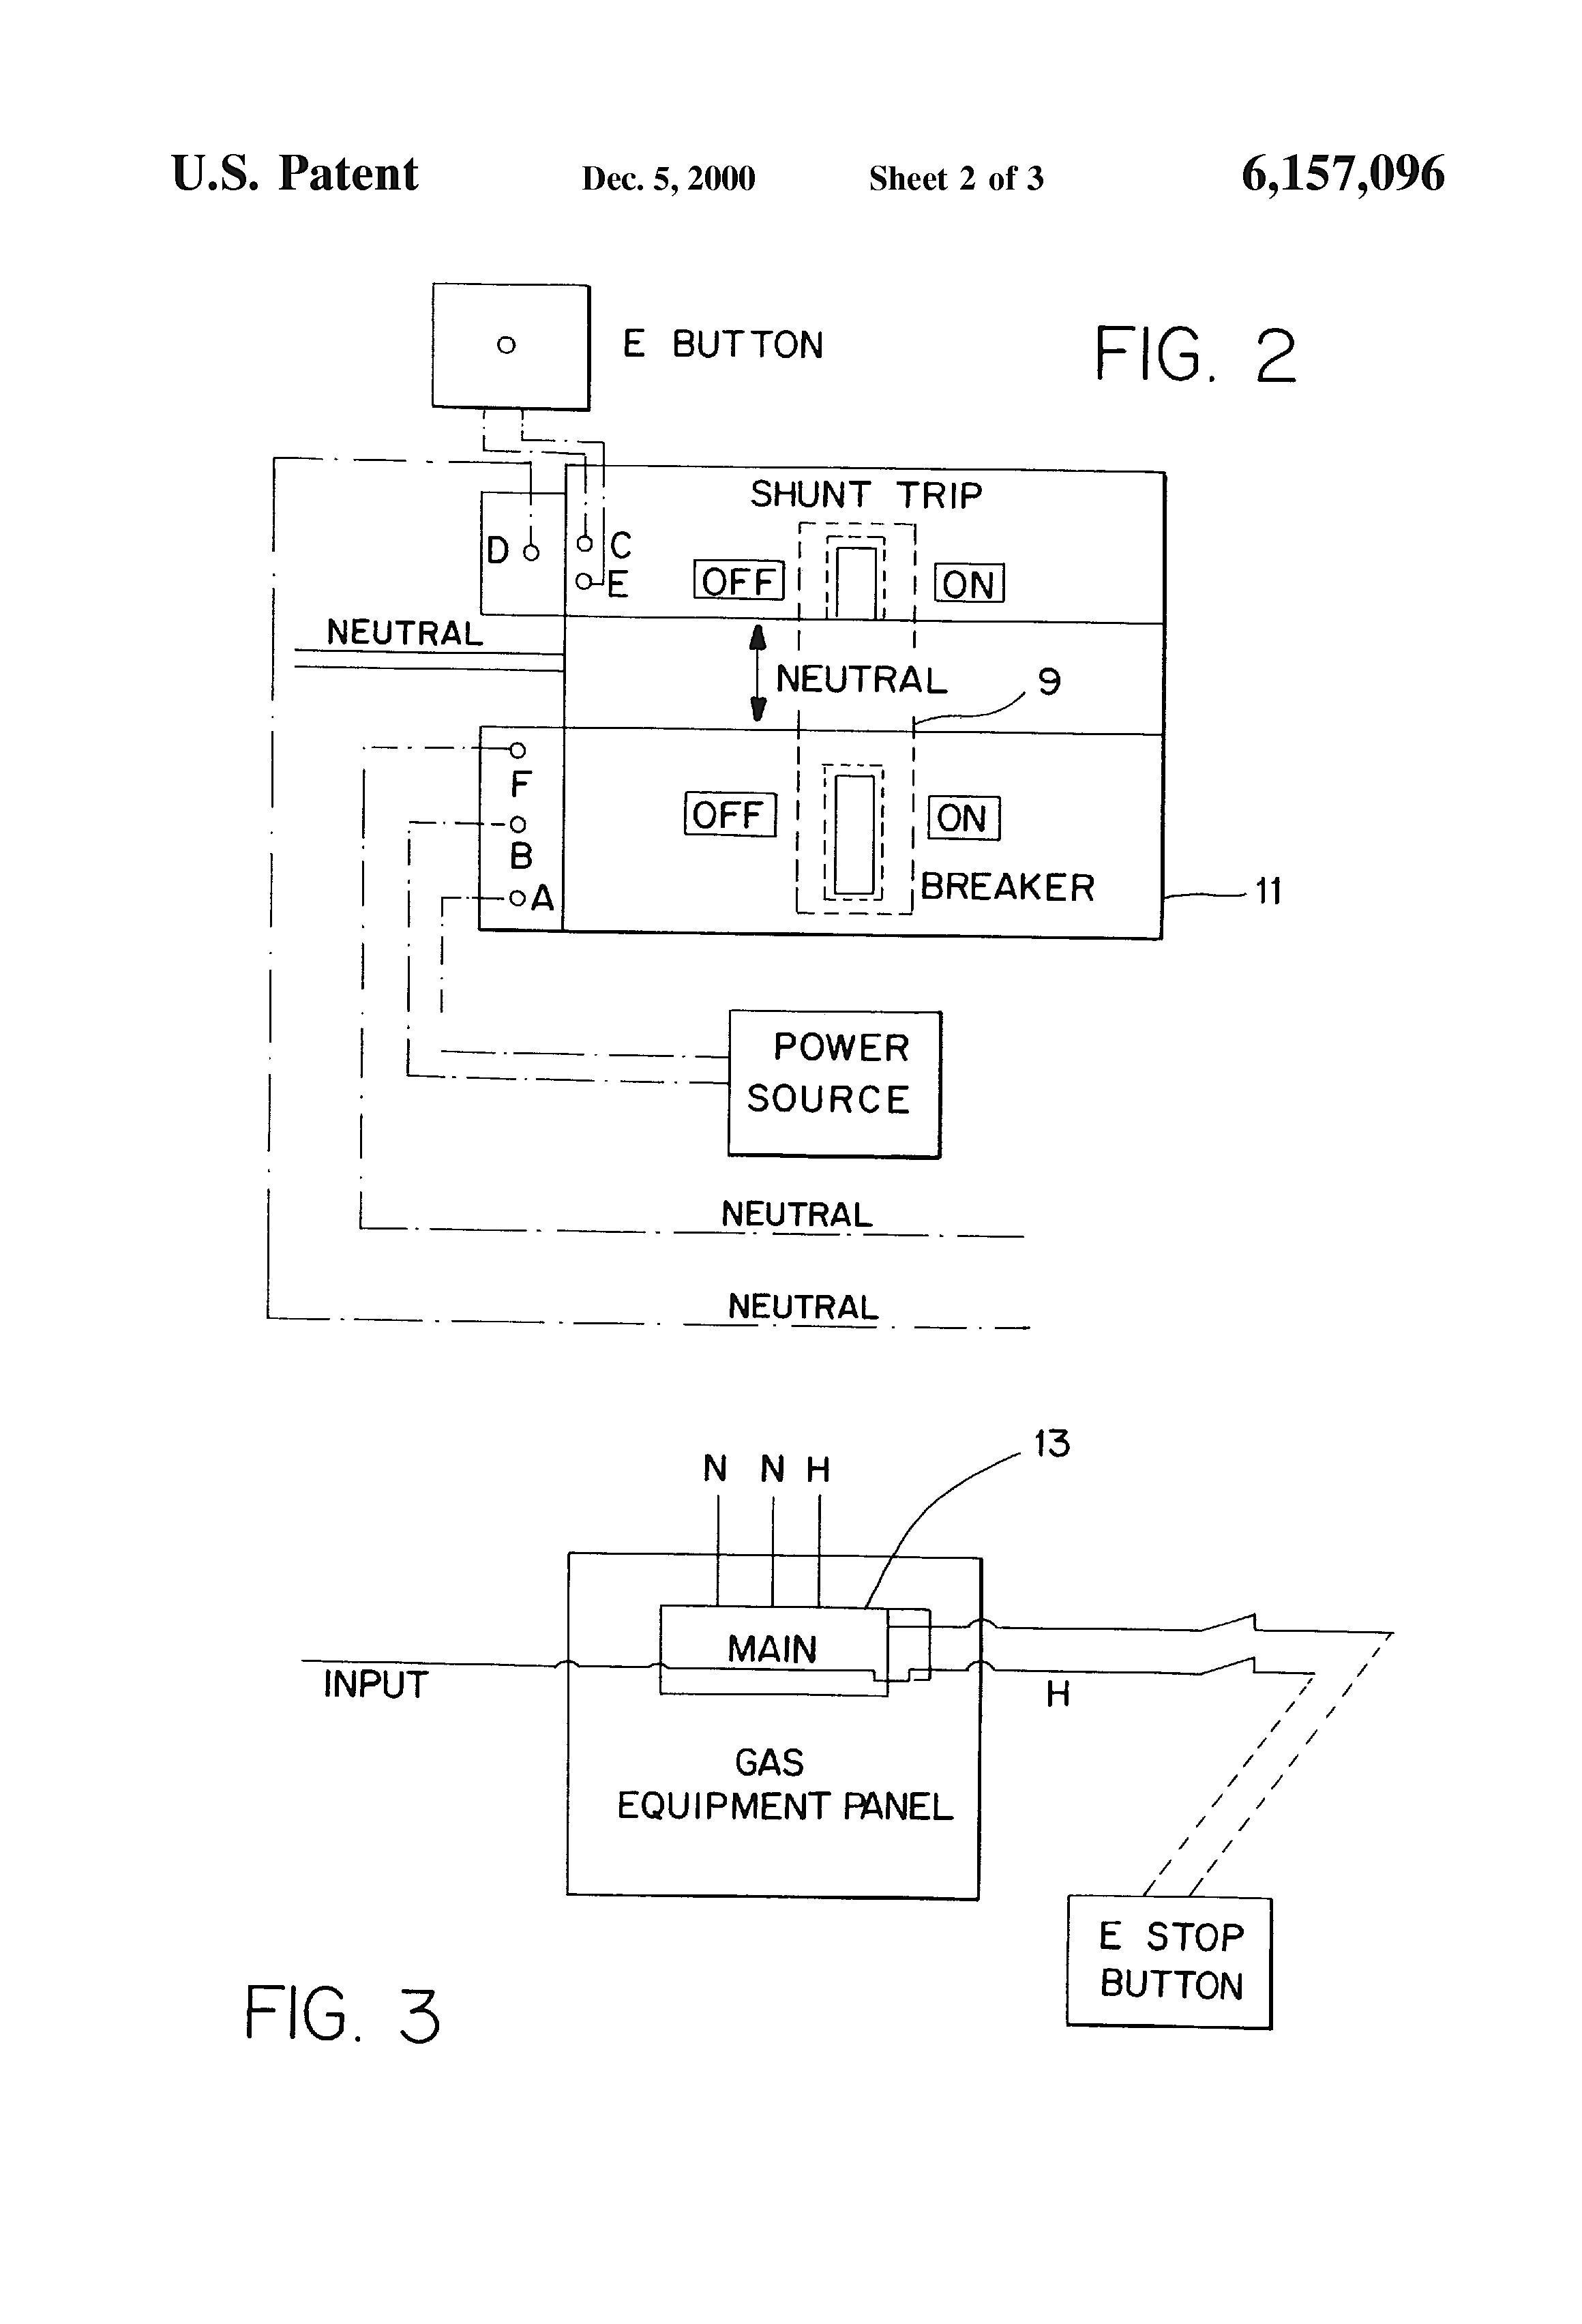 Ansul R 102 Wiring Diagram | Wiring Library - Ansul System Wiring Diagram